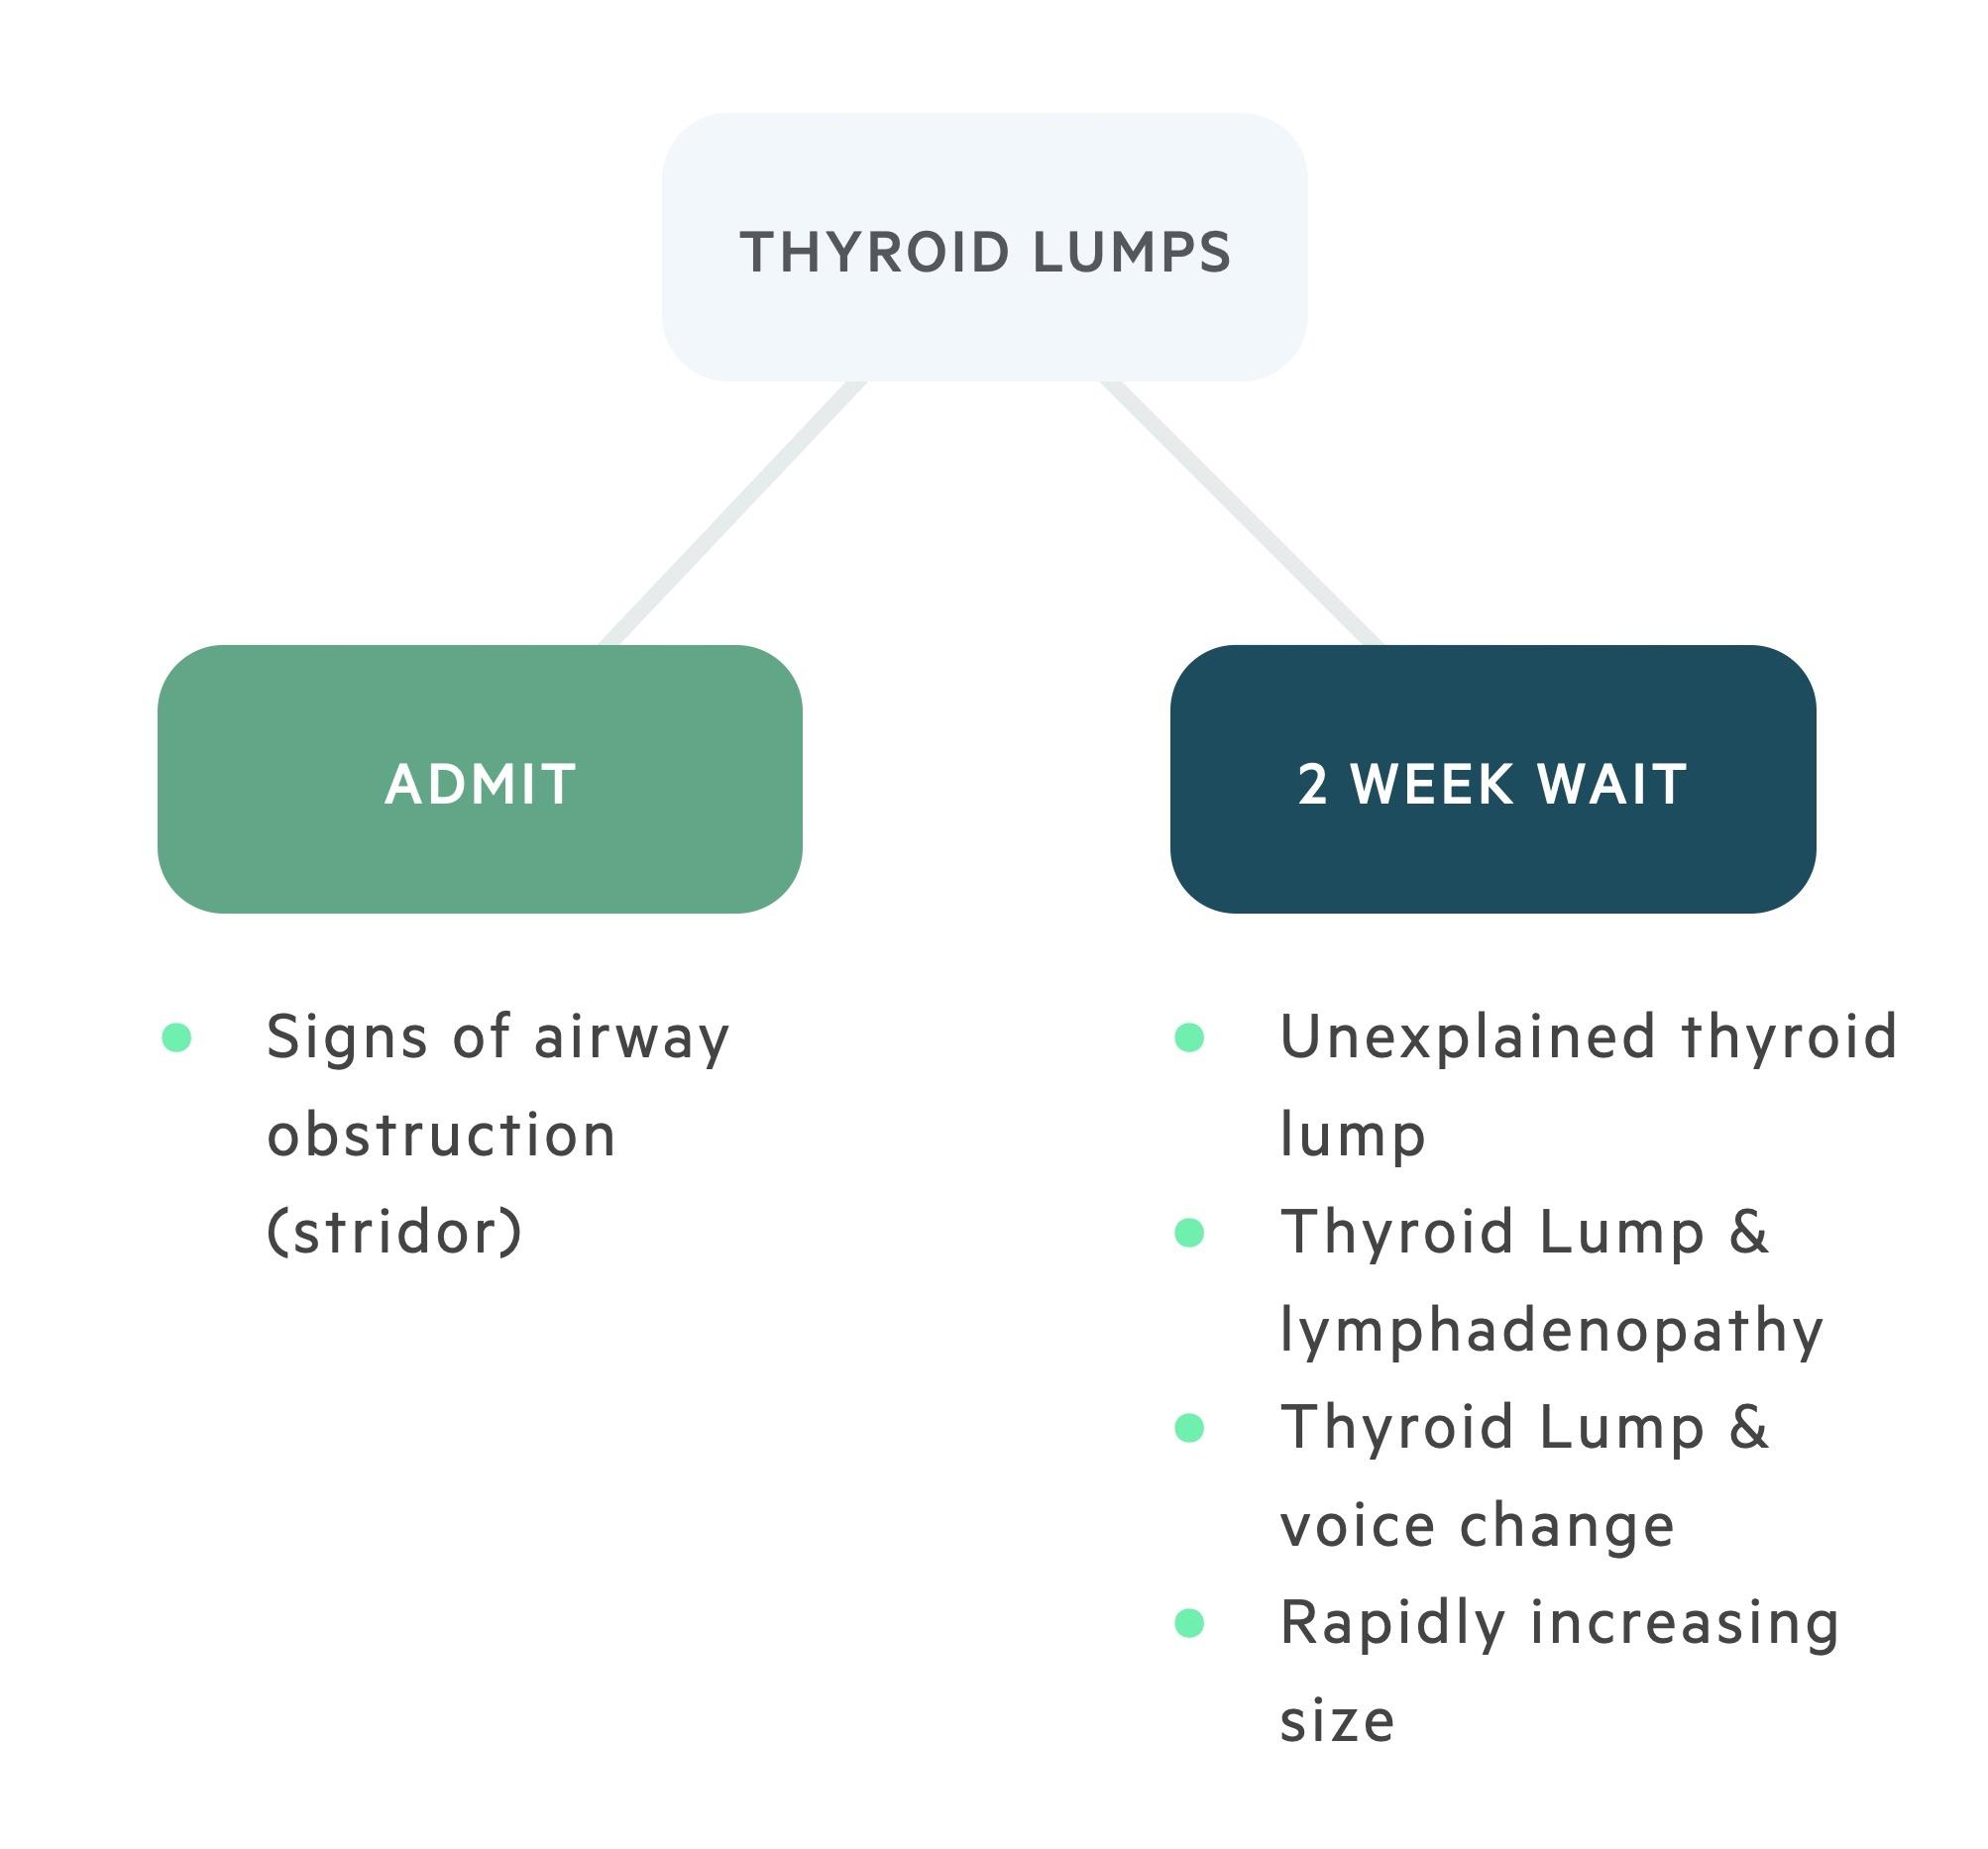 Referral of thyroid lump